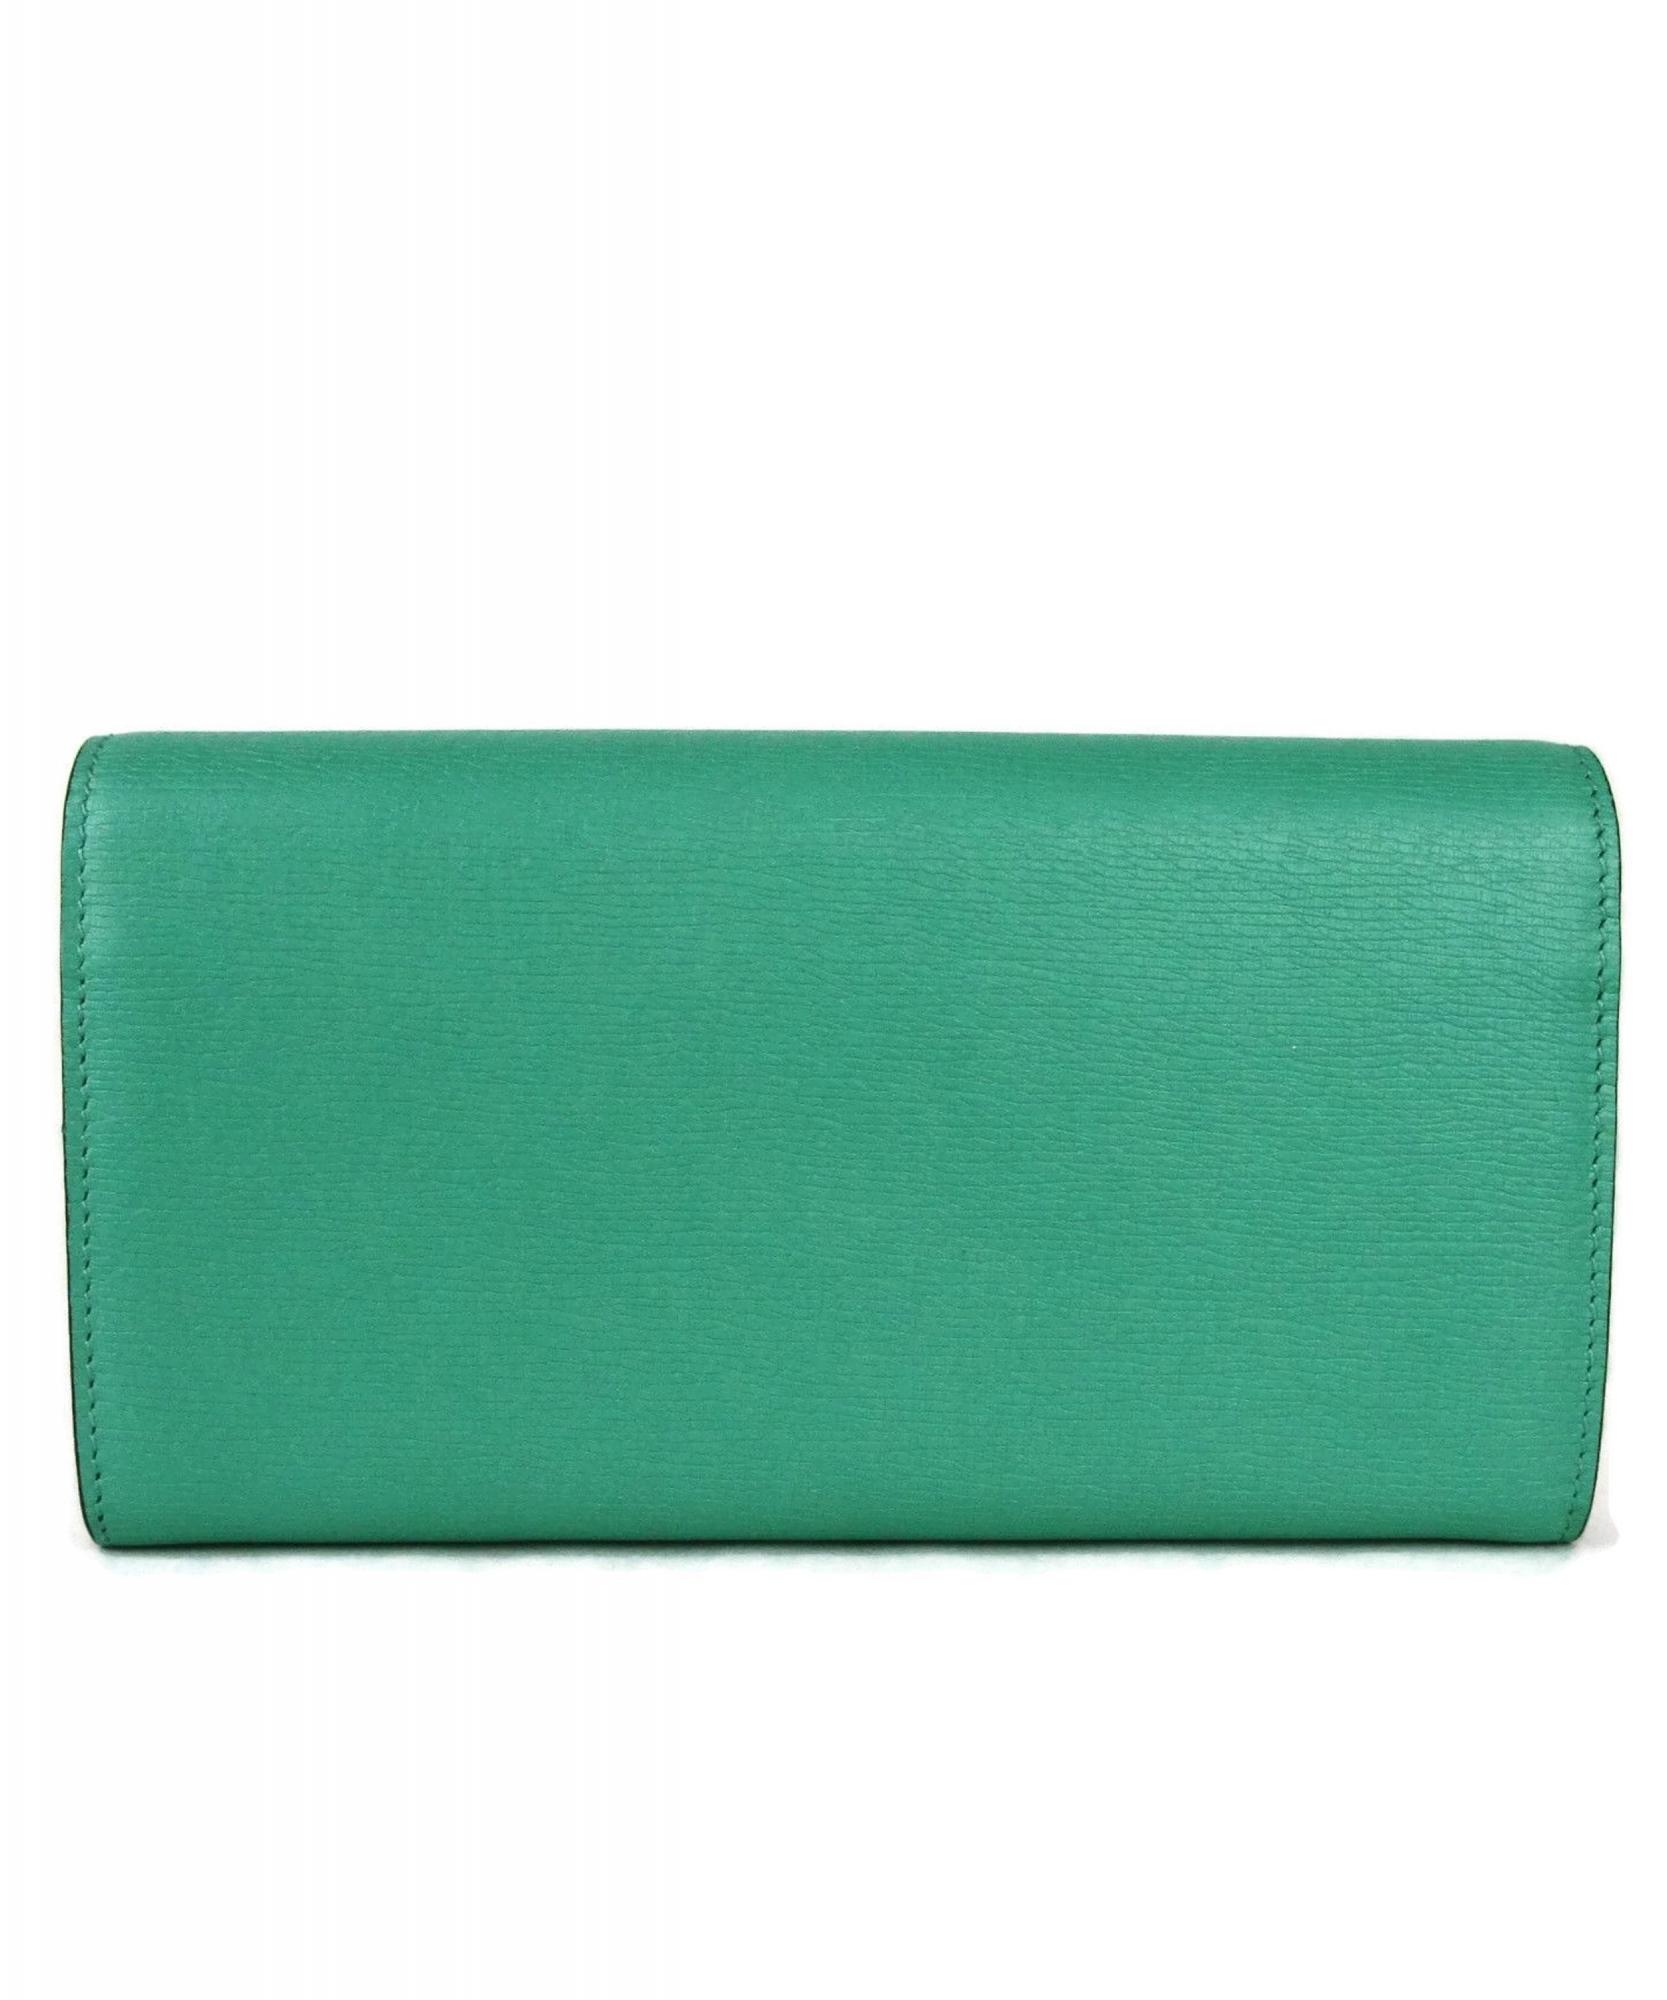 Gucci Rust Leather Horsebit Wallet